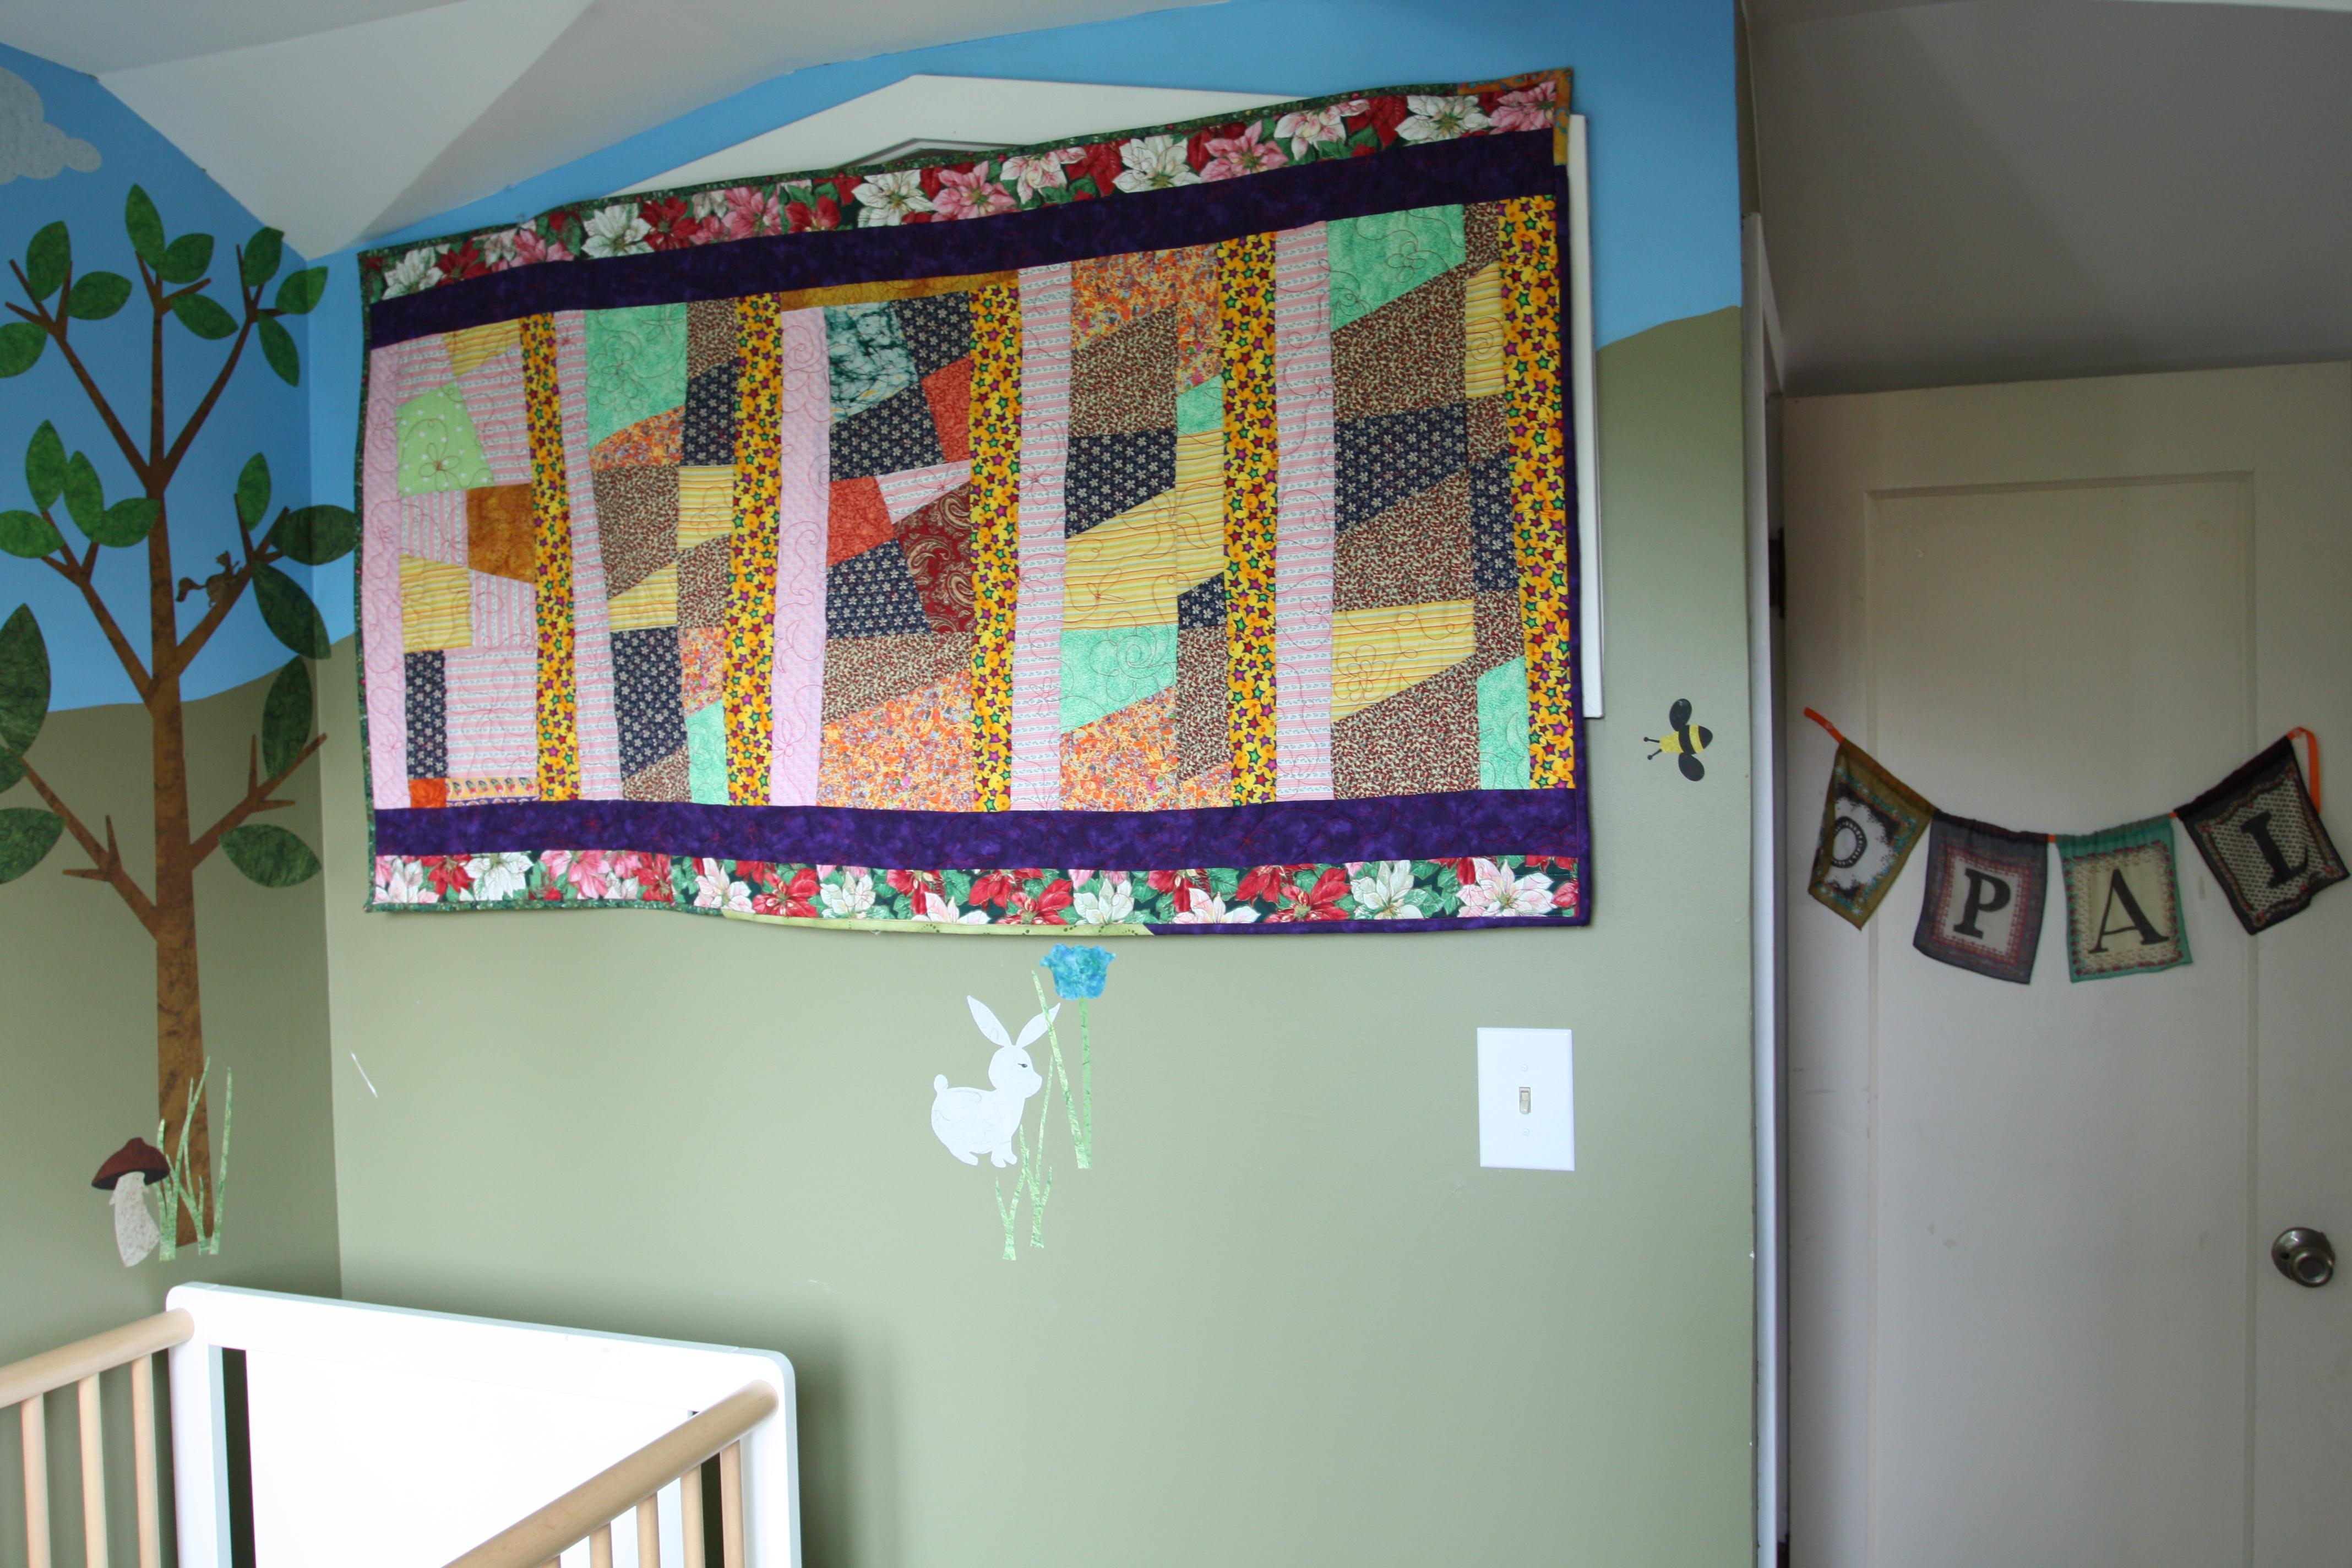 Netzy's quilt